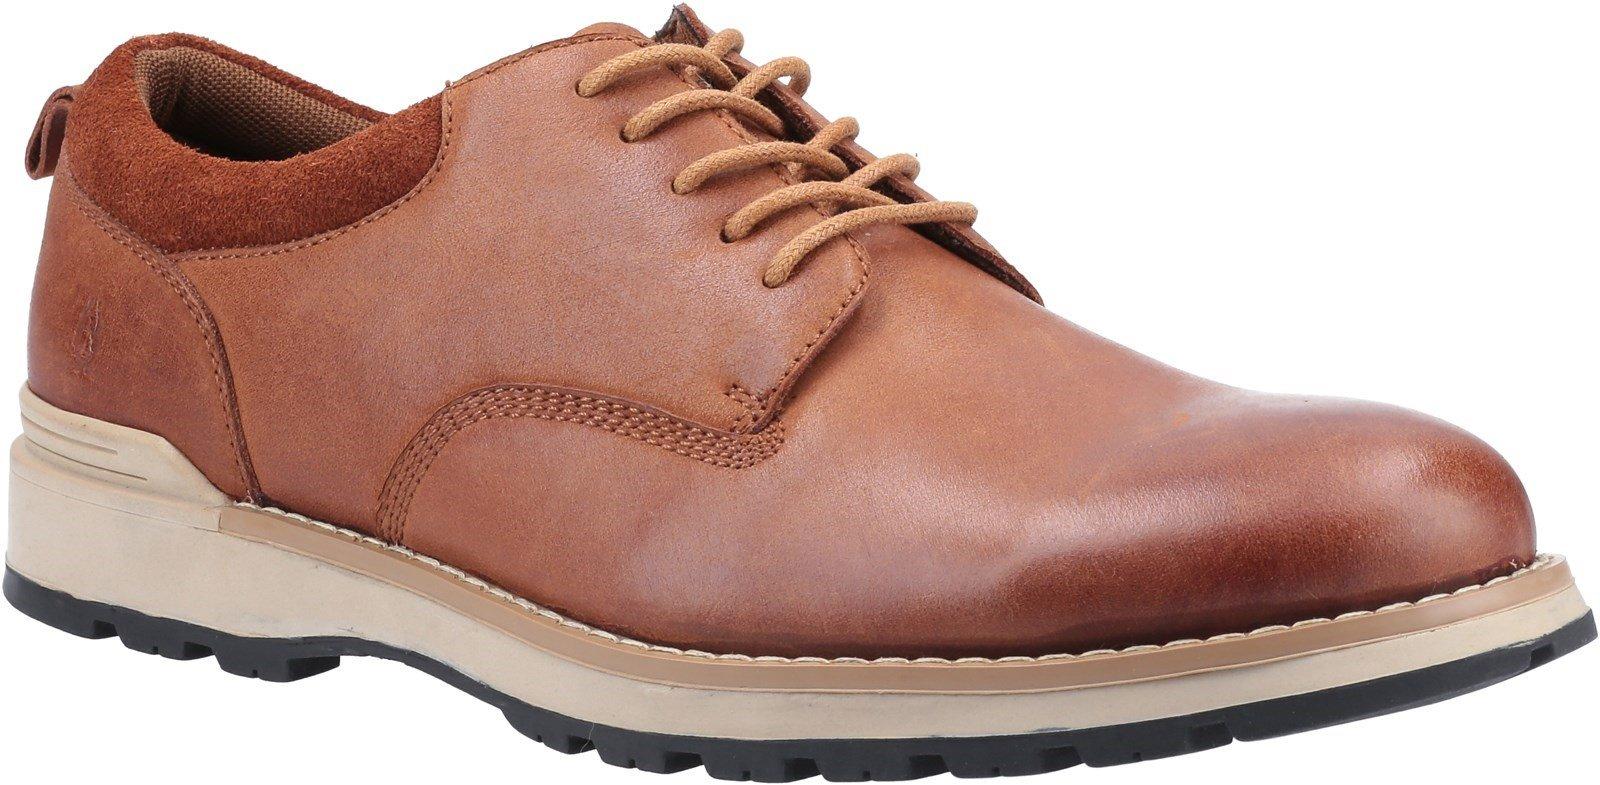 Hush Puppies Men's Dylan Lace Derby Shoes Various Colours 31996 - Tan 6